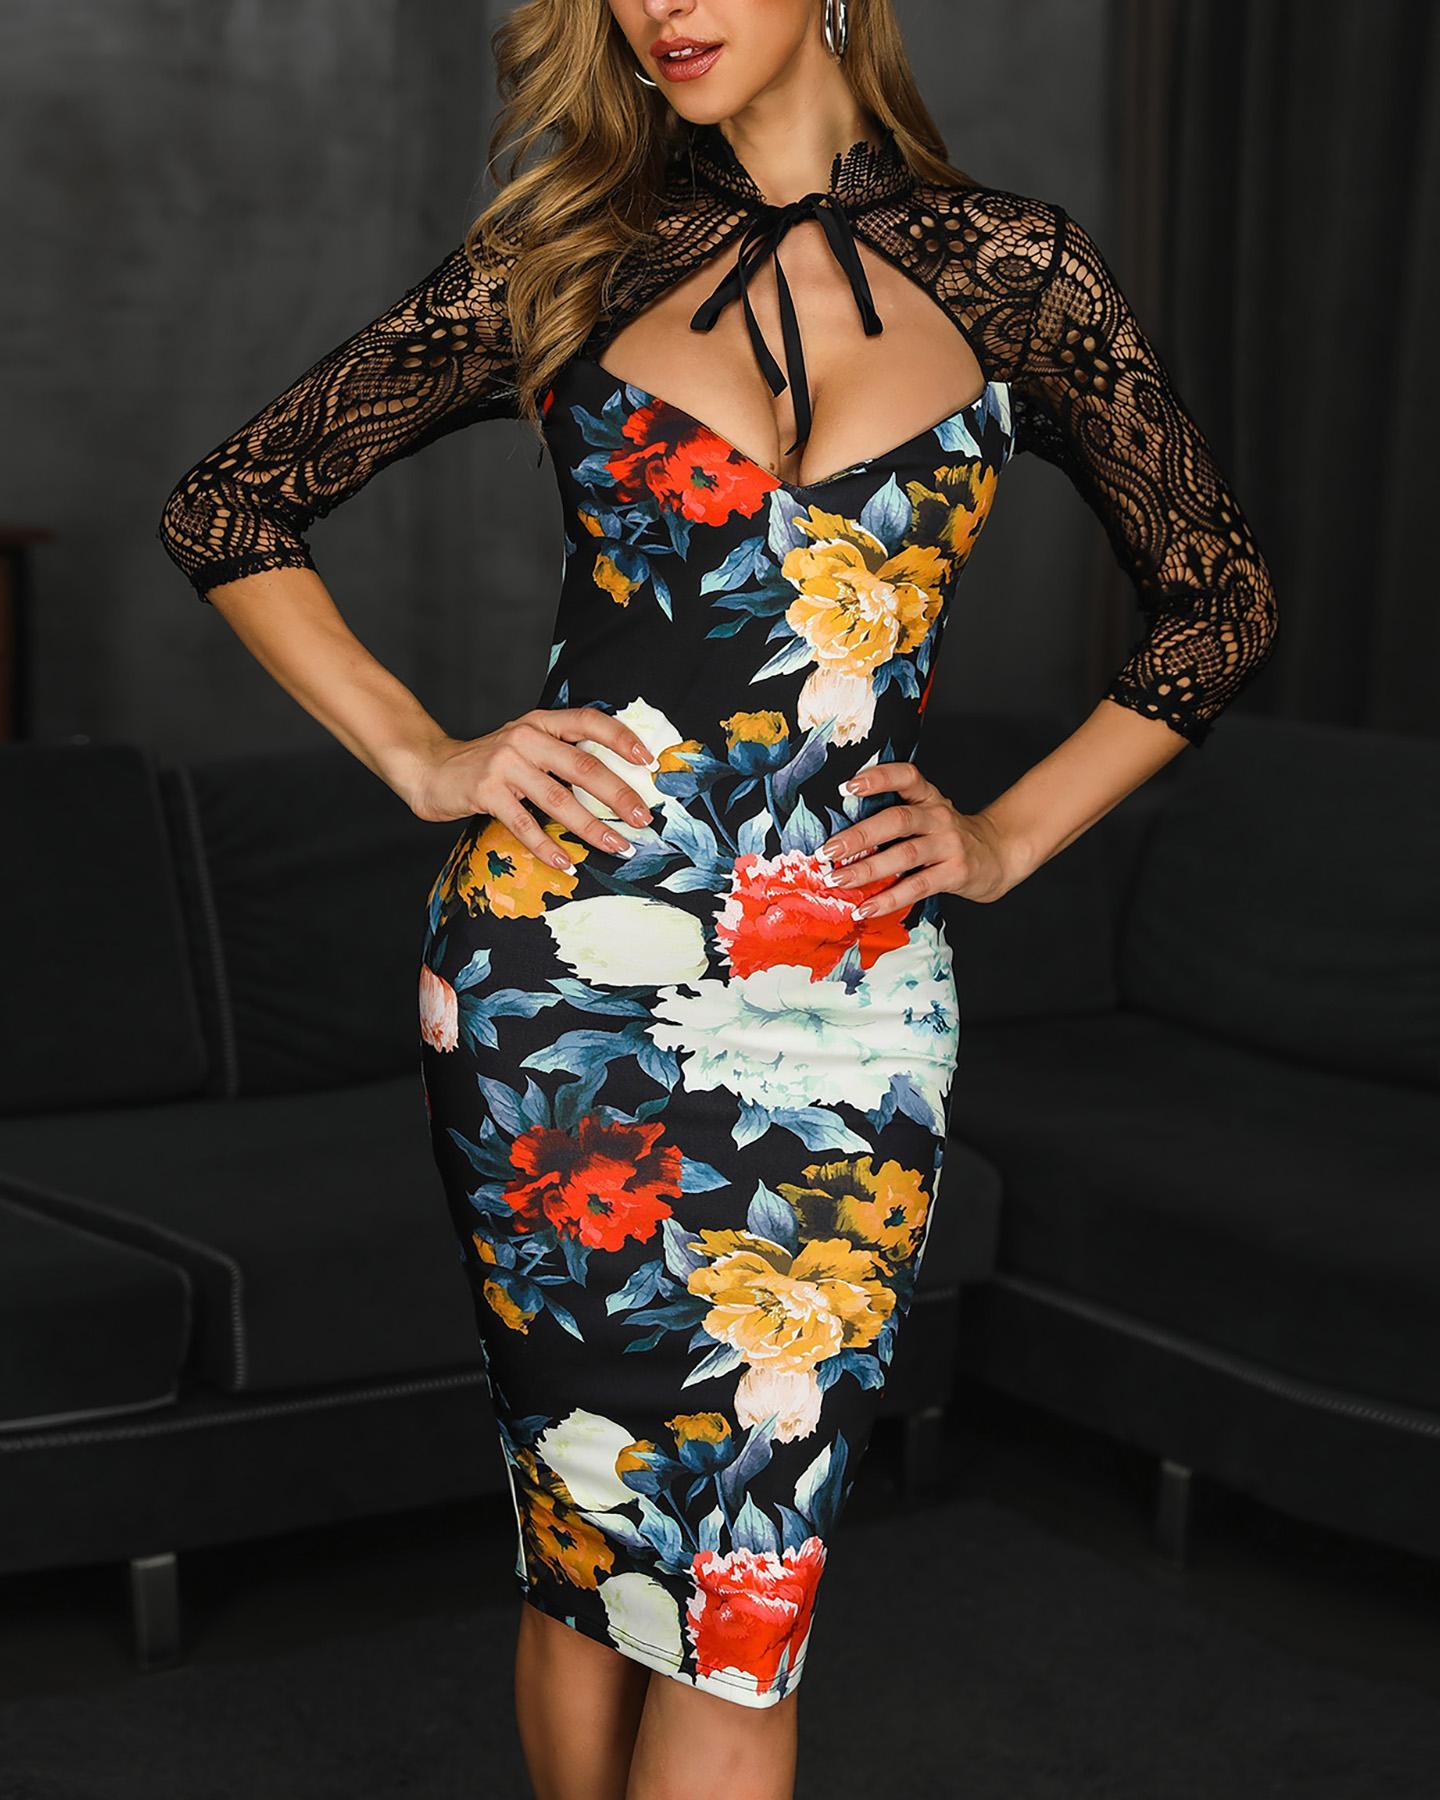 Floral Print Lace Insert Cutout Bodycon Dress